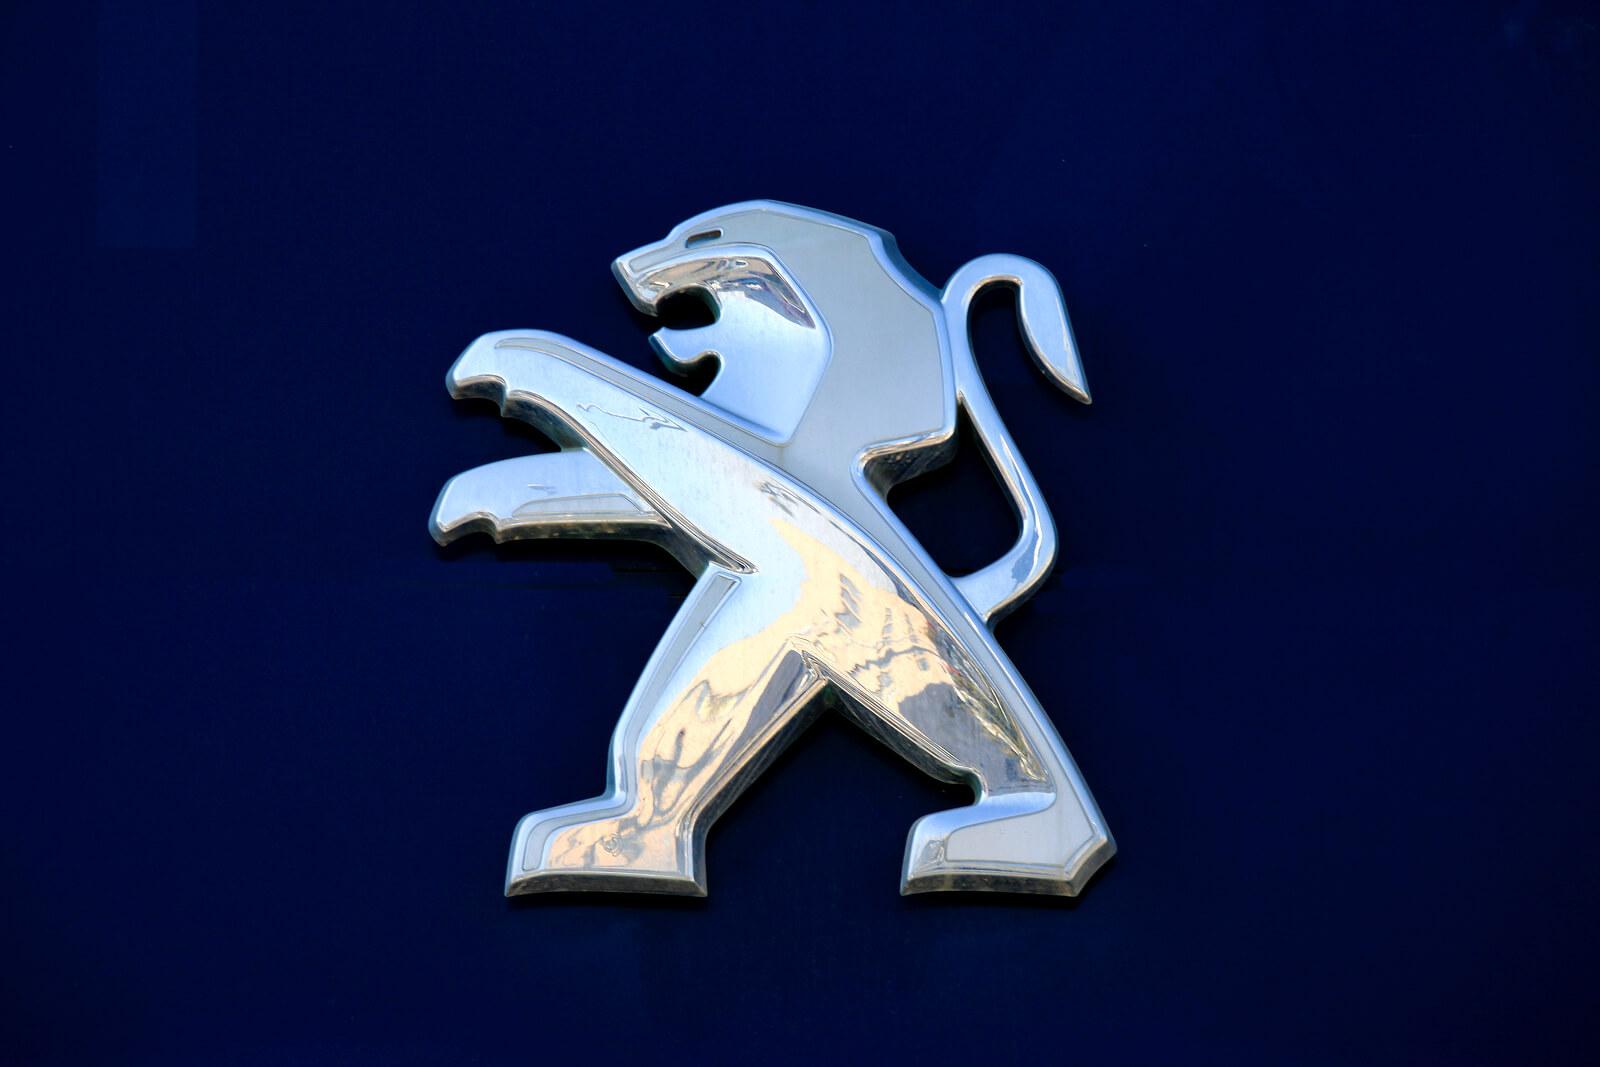 Southbank Peugeot Mechanic